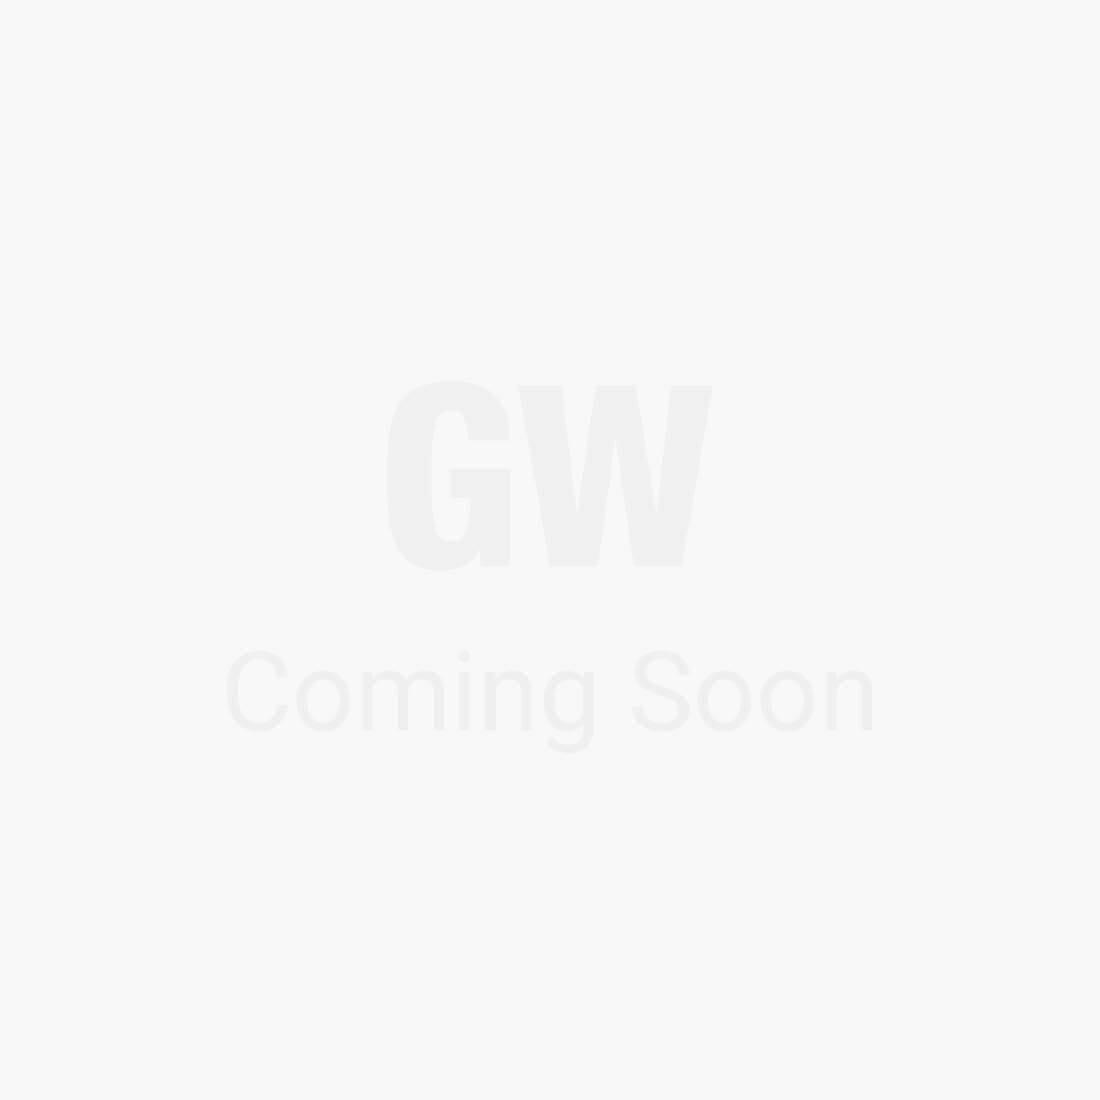 Ethnicraft Oblic Side Table